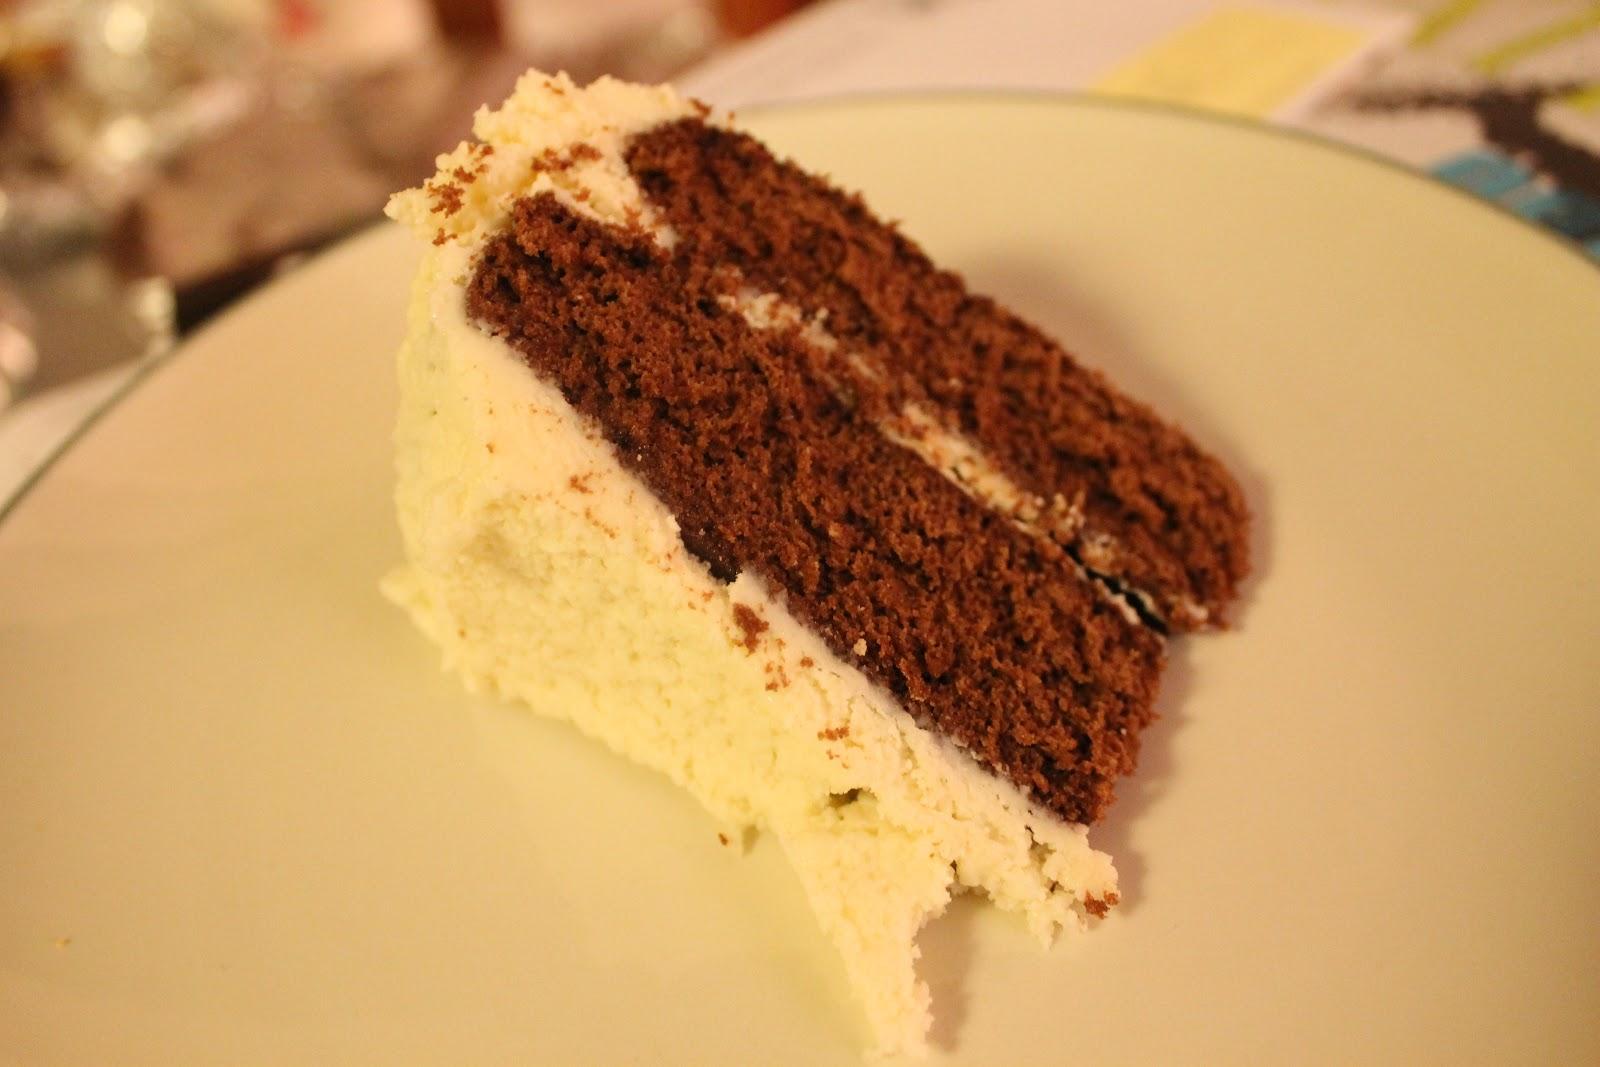 Cooking through Disney: Dark Chocolate Cake